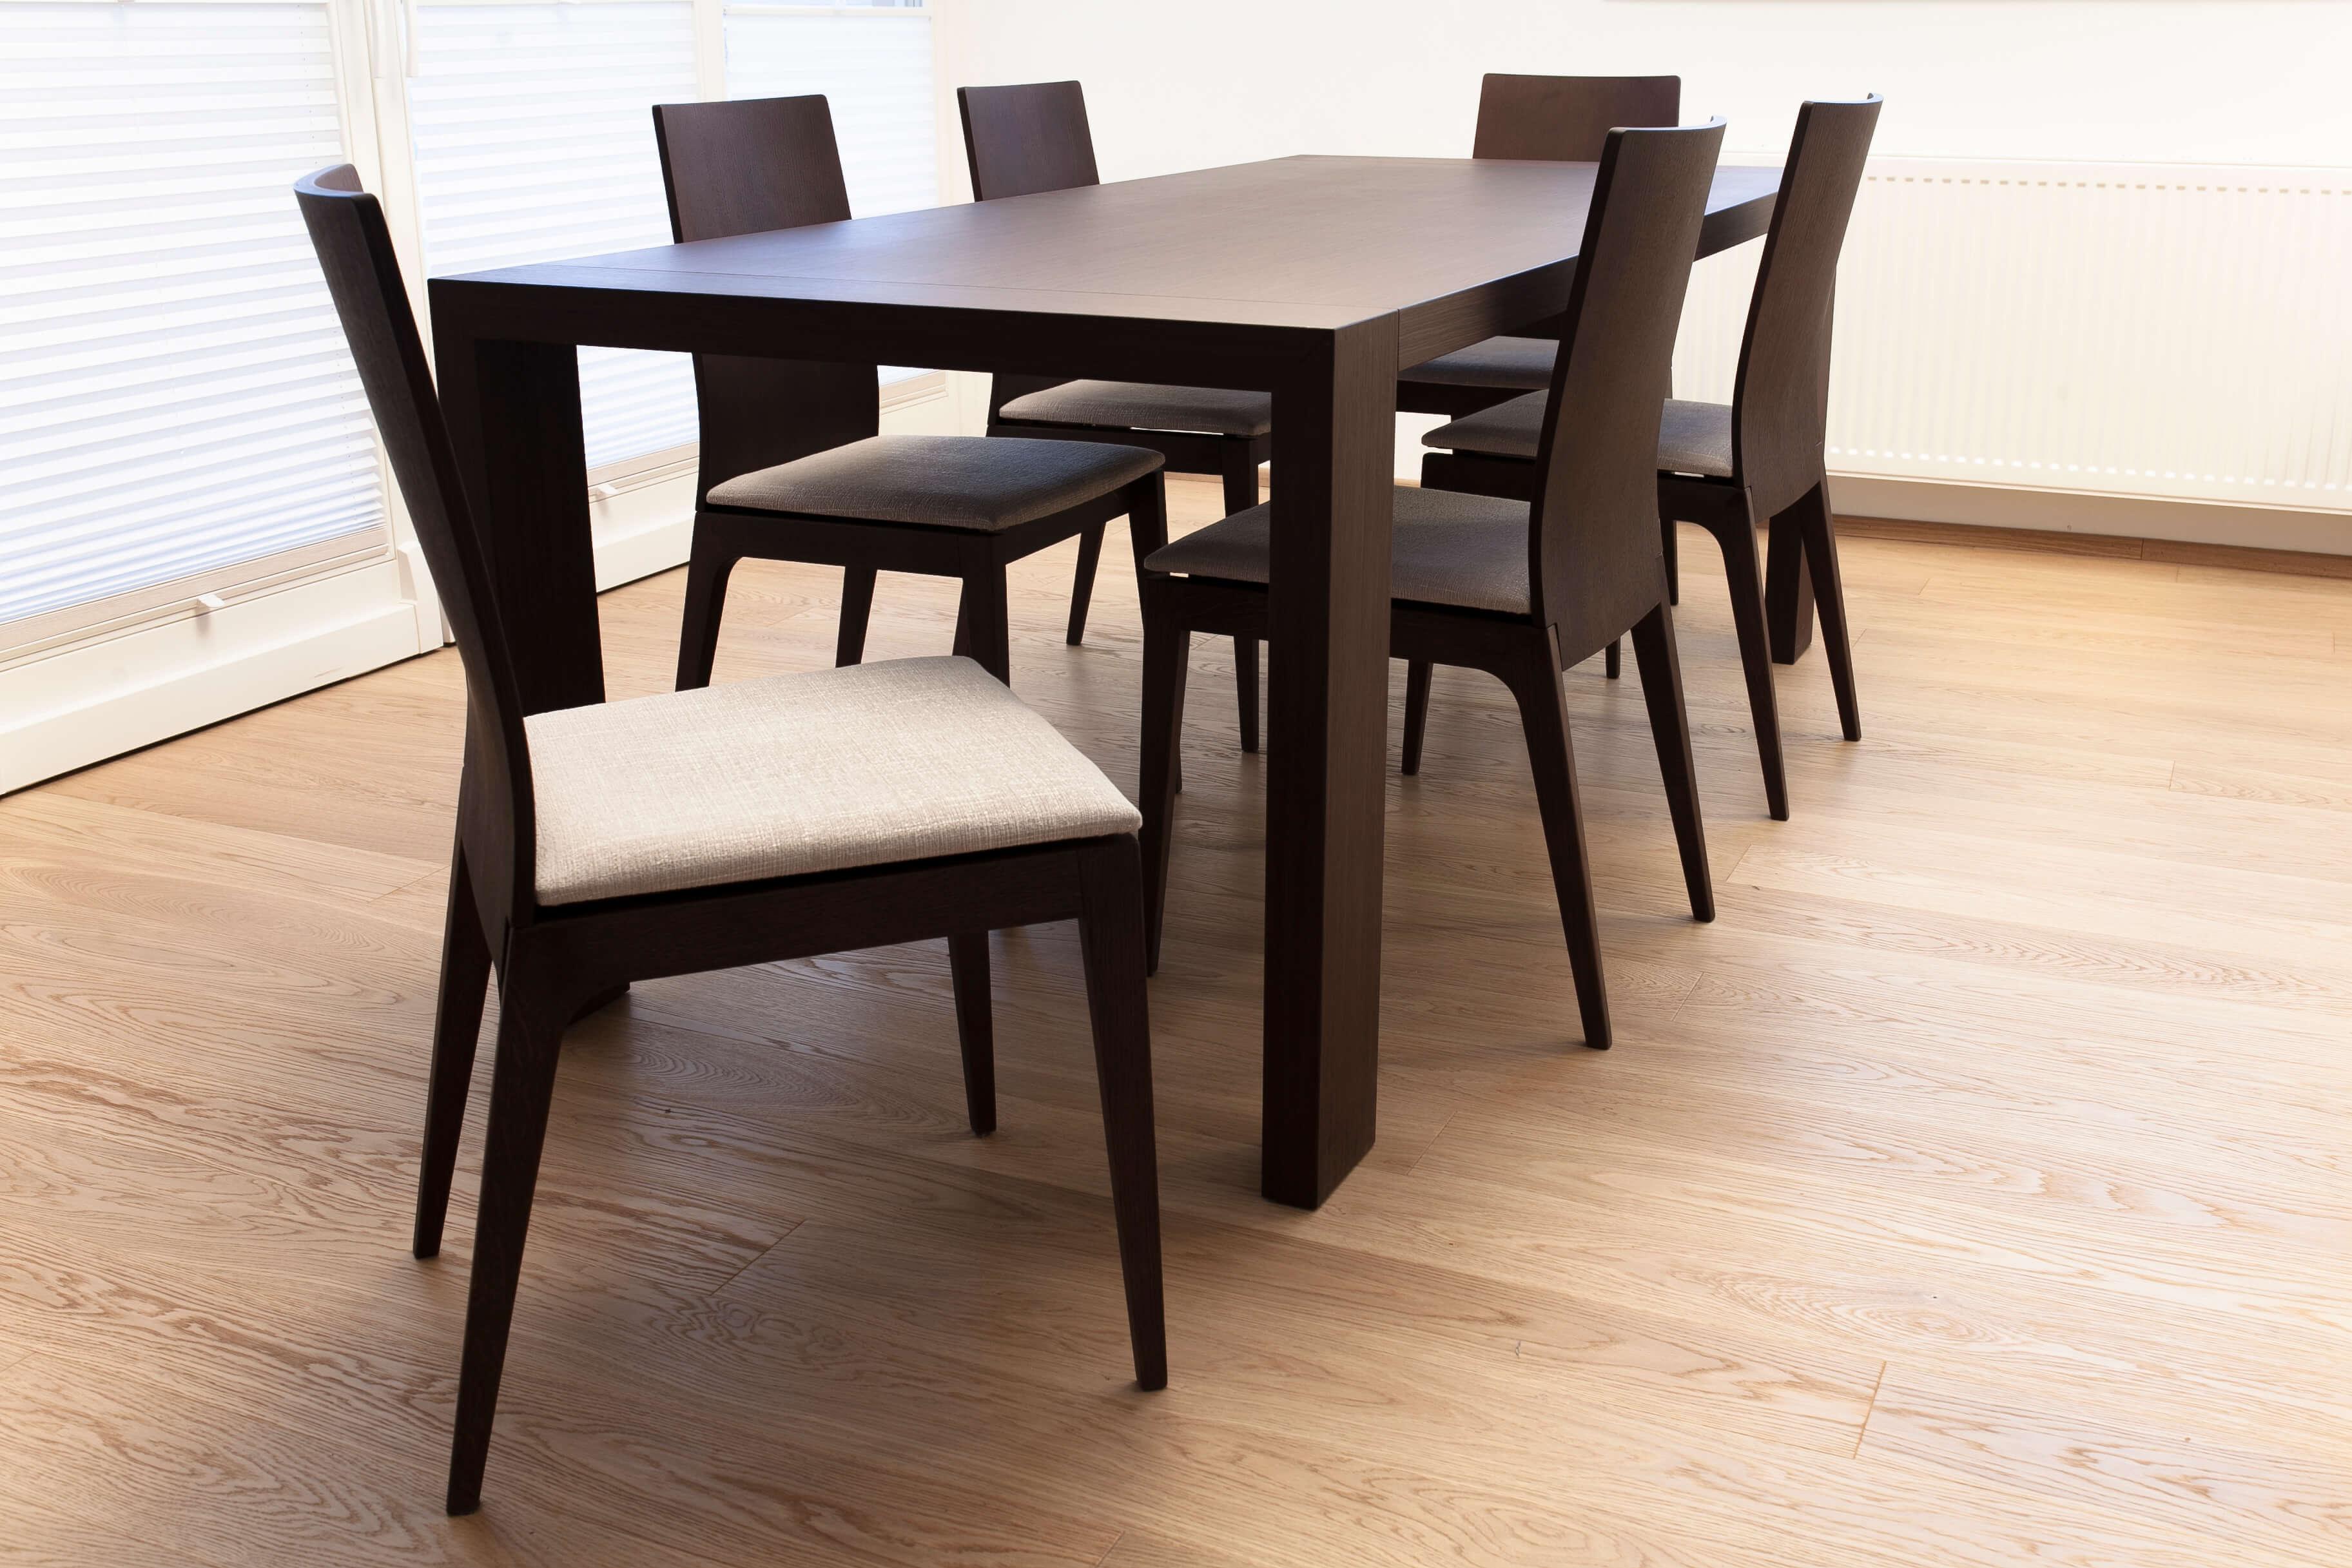 Furnirana miza in stoli za jedilnico